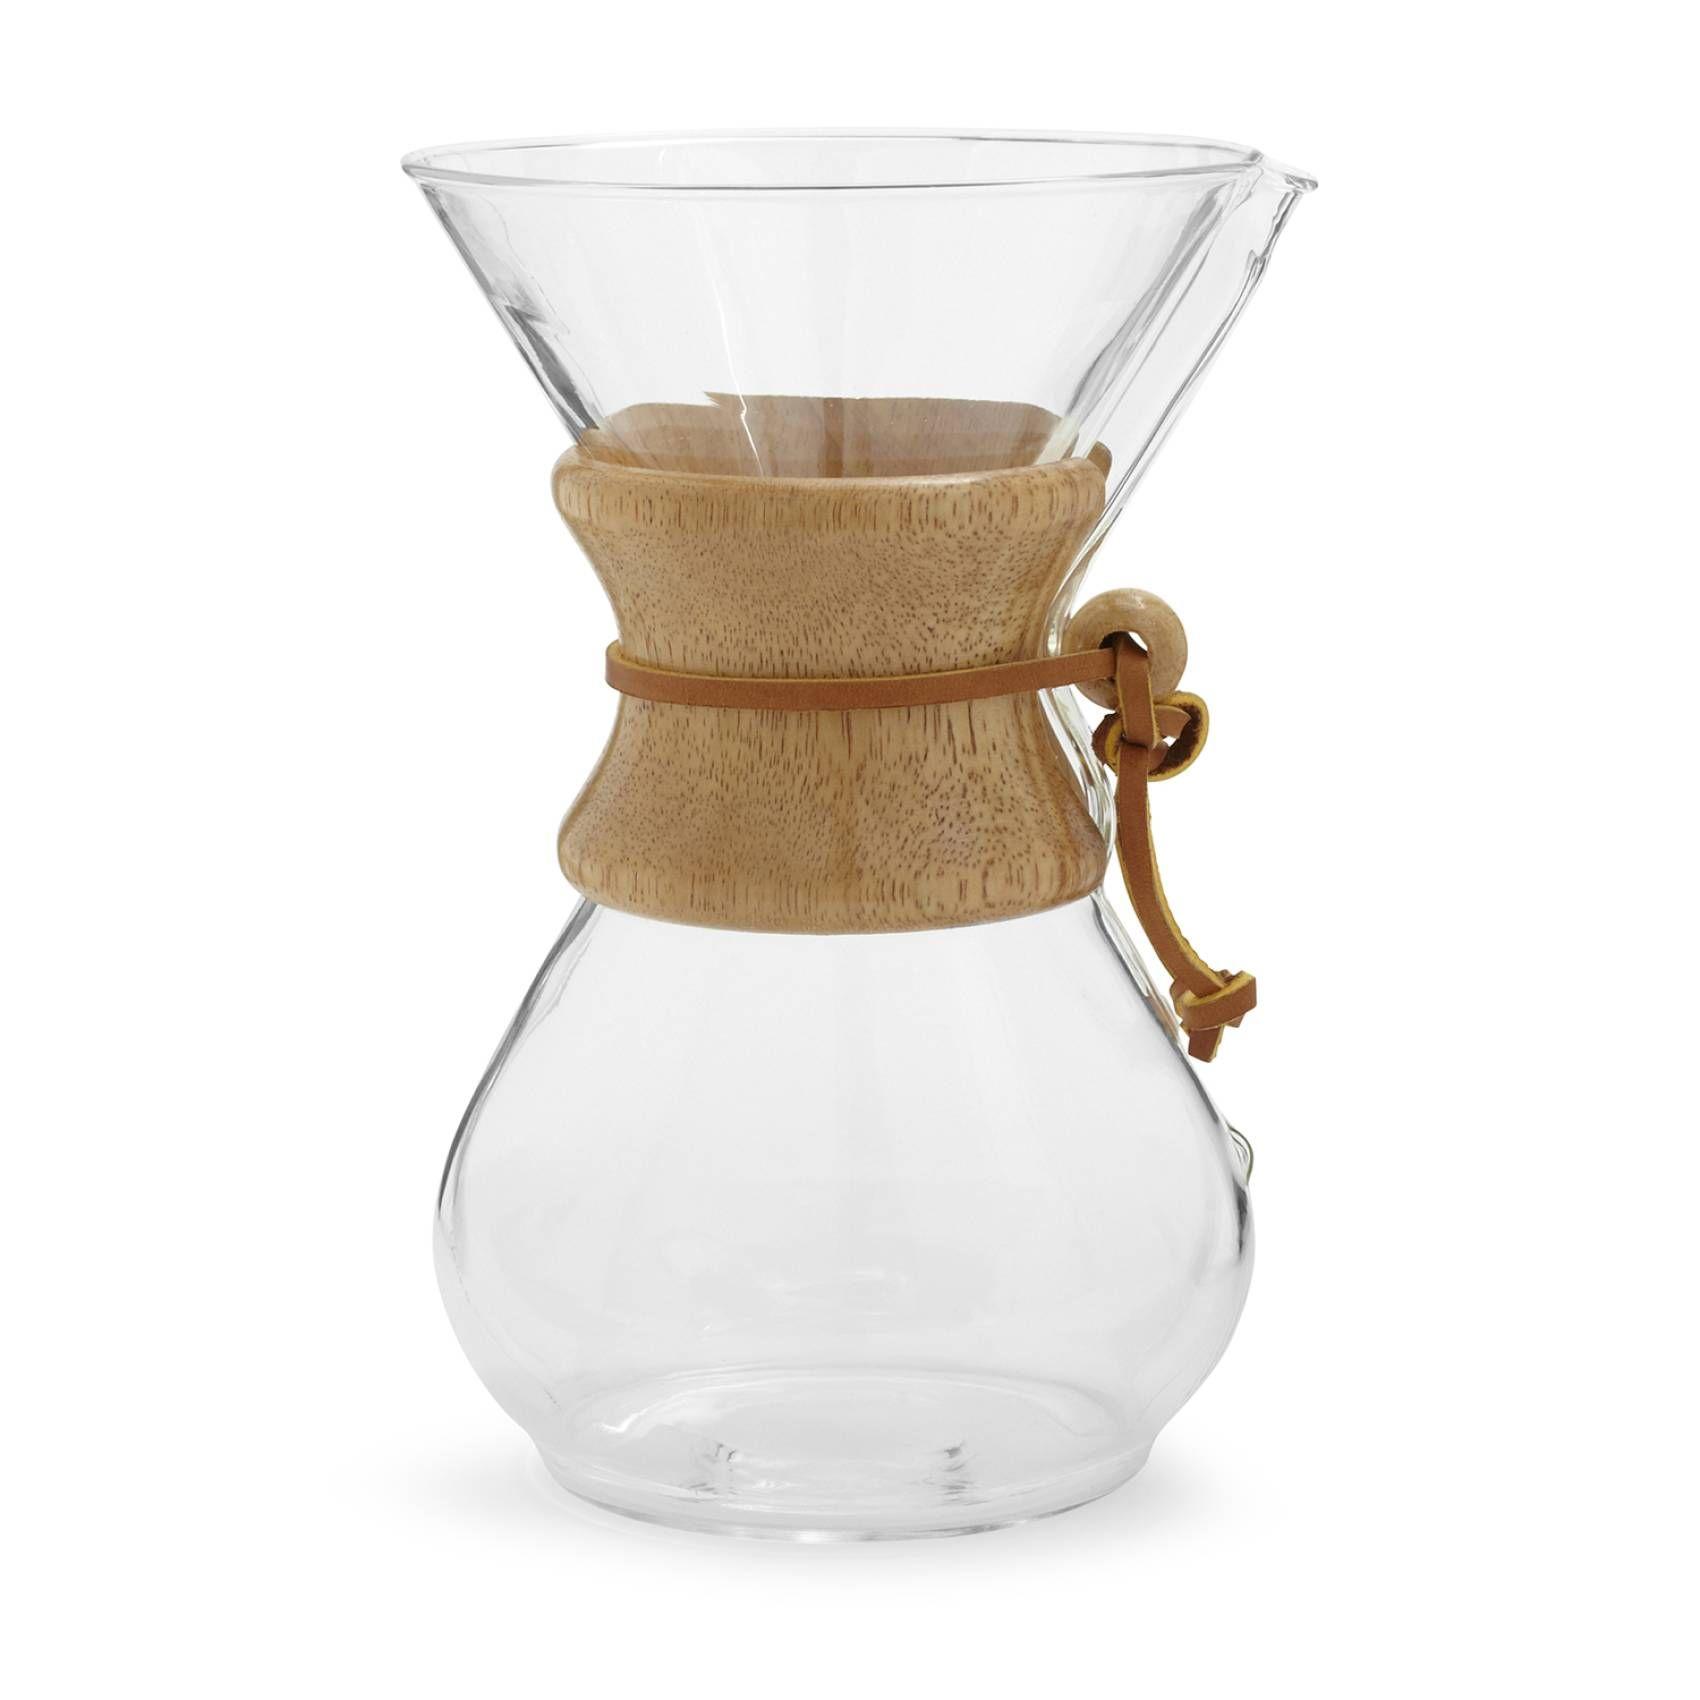 Chemex Clic Series Drip Coffee Gl Makers